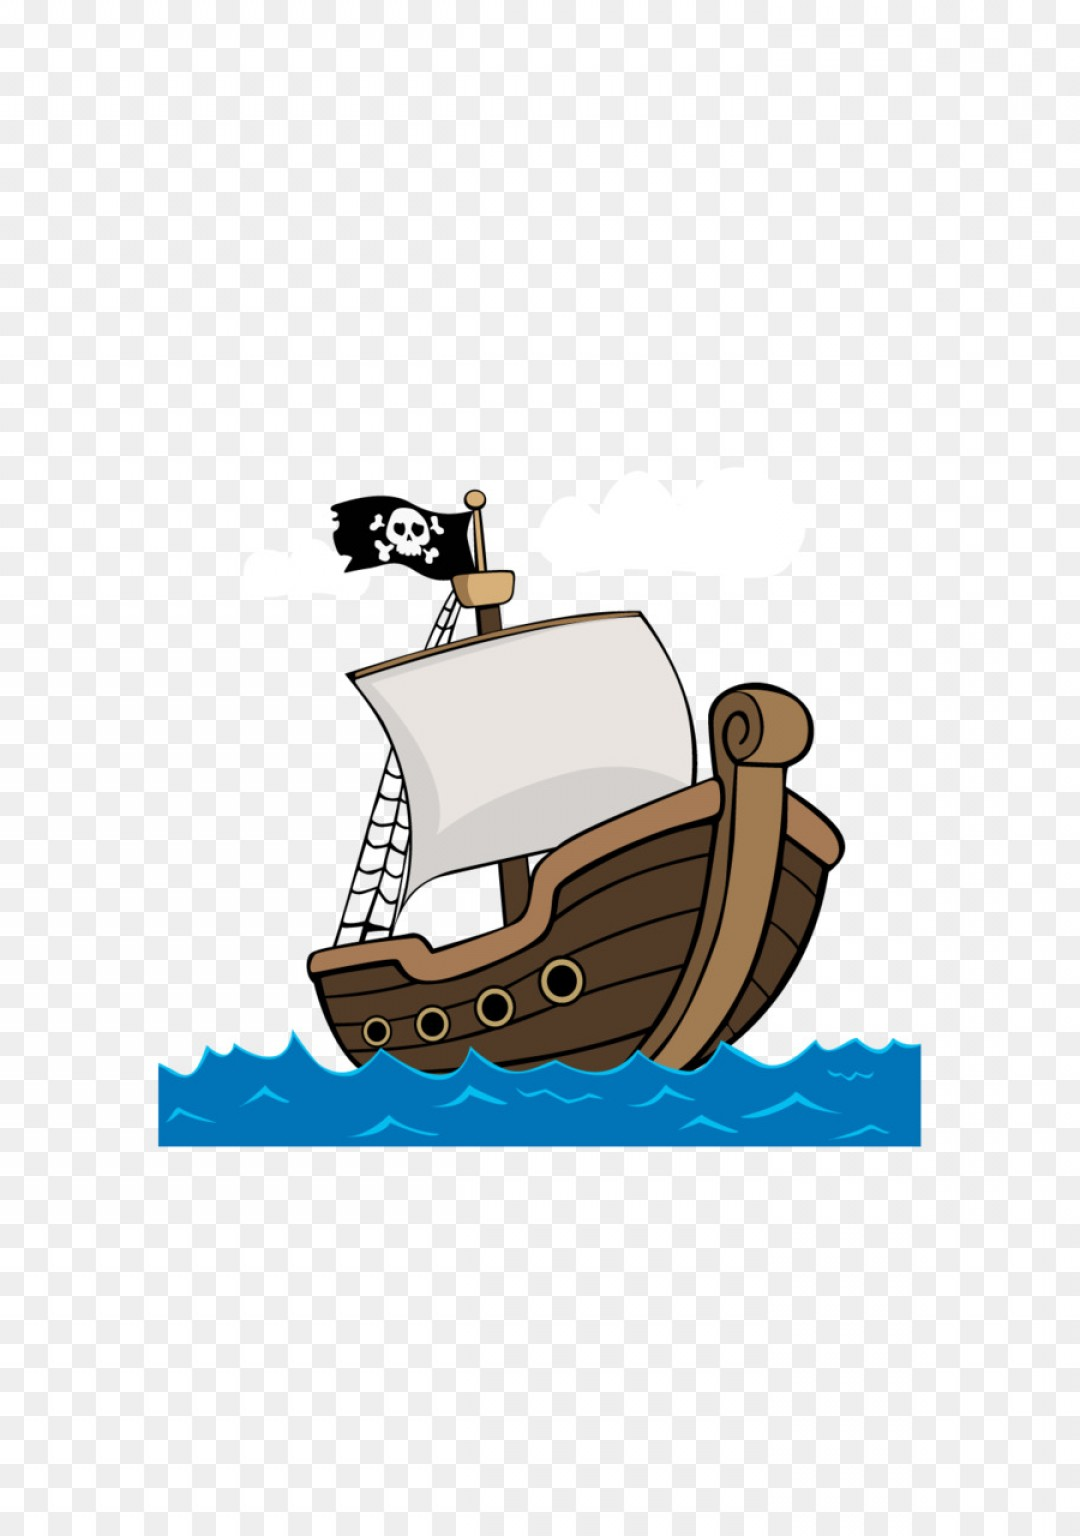 Png Cartoon Ship Piracy Vector Pirate Ship.